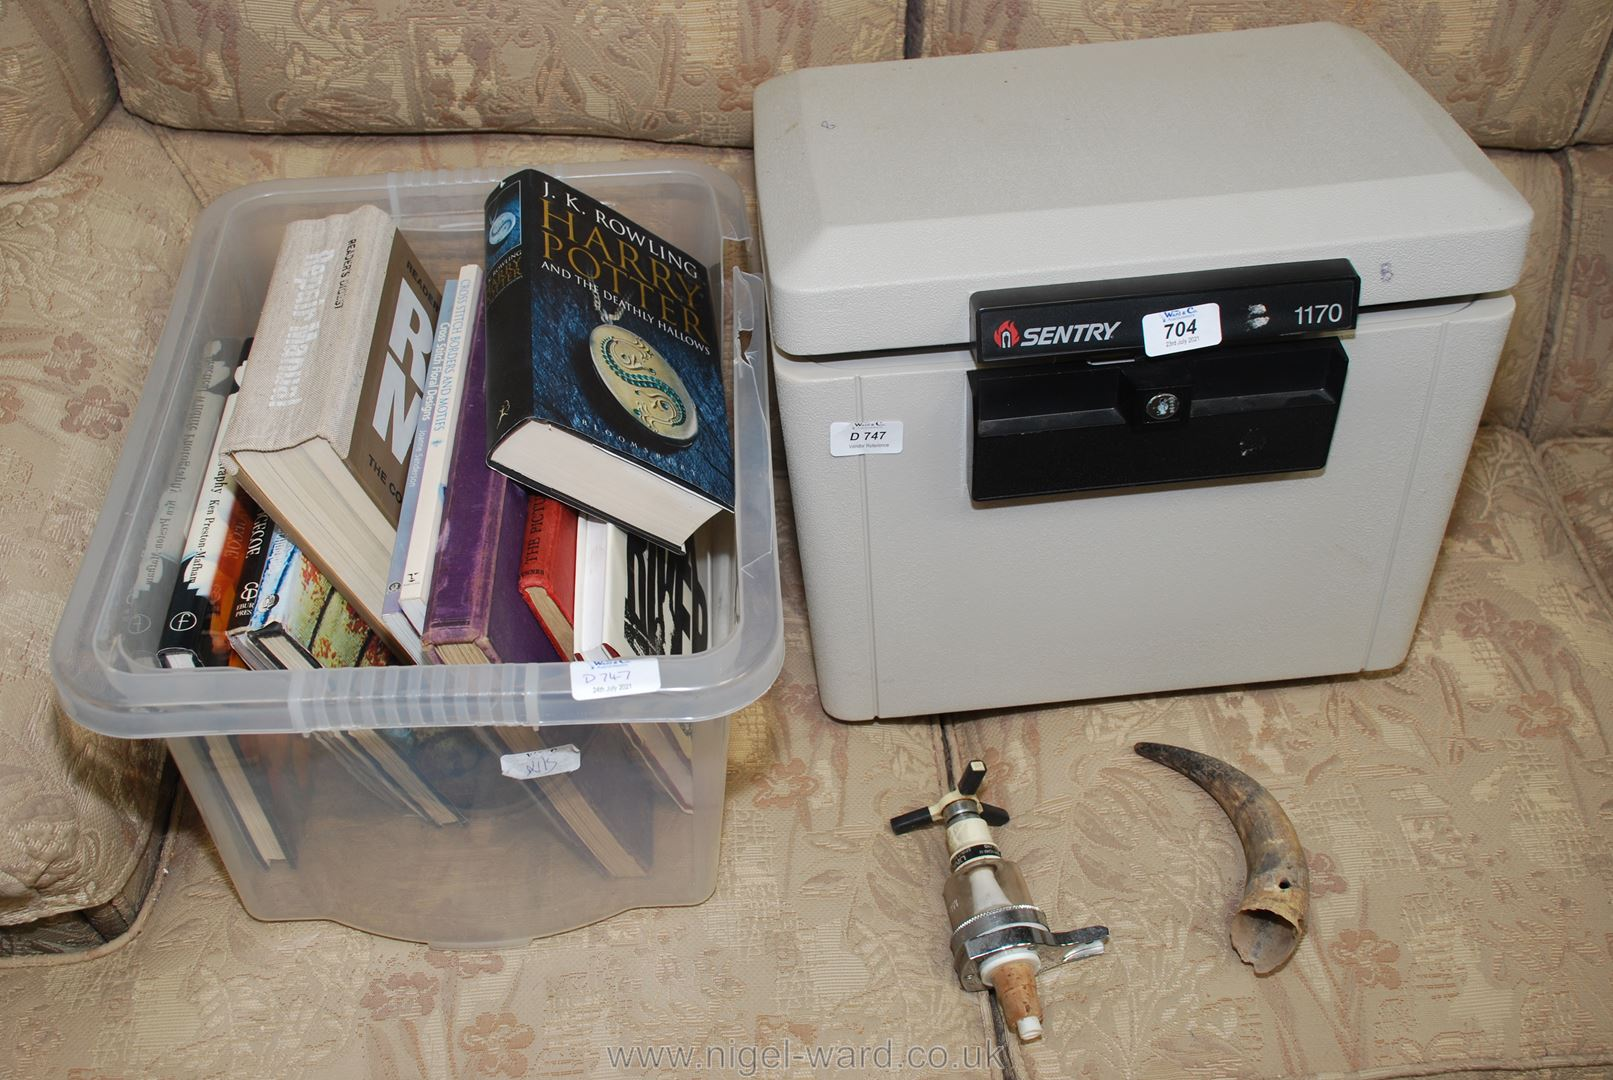 Sentry 1170 security box, no key, box of books including Harry Potter,